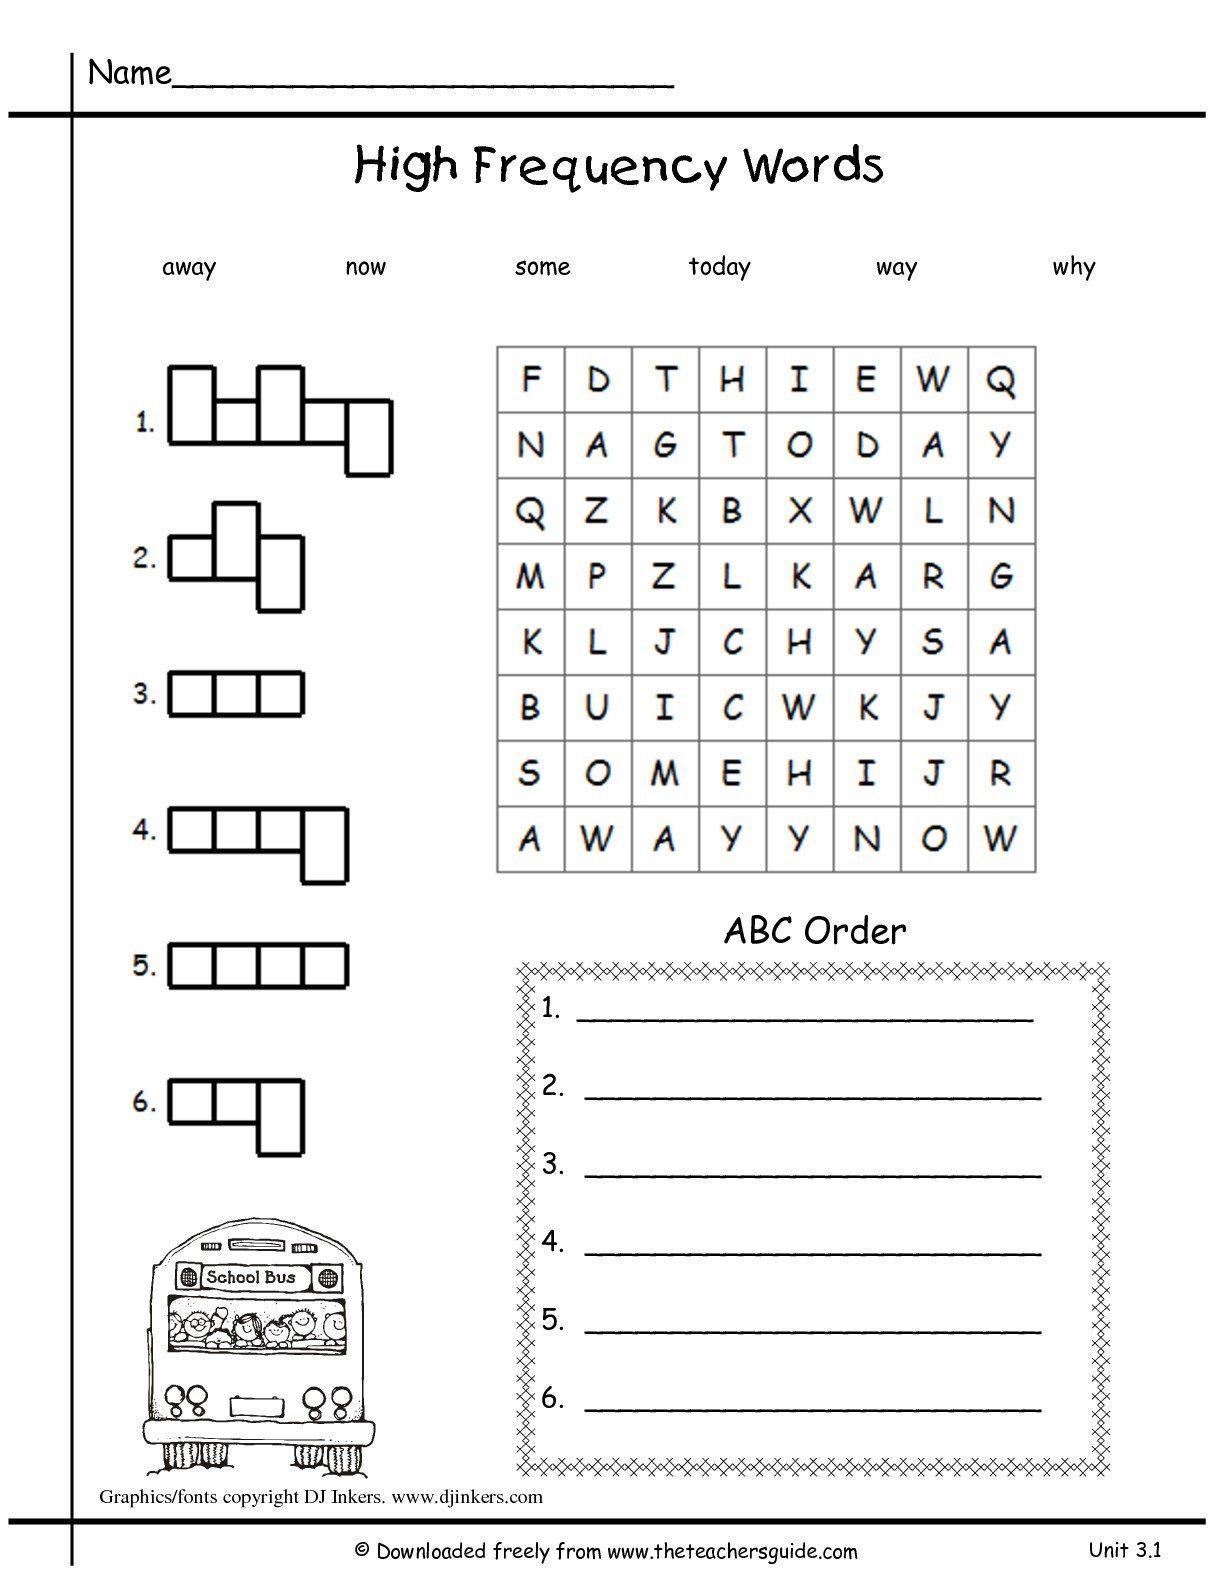 Verb Worksheets For 1st Grade Free